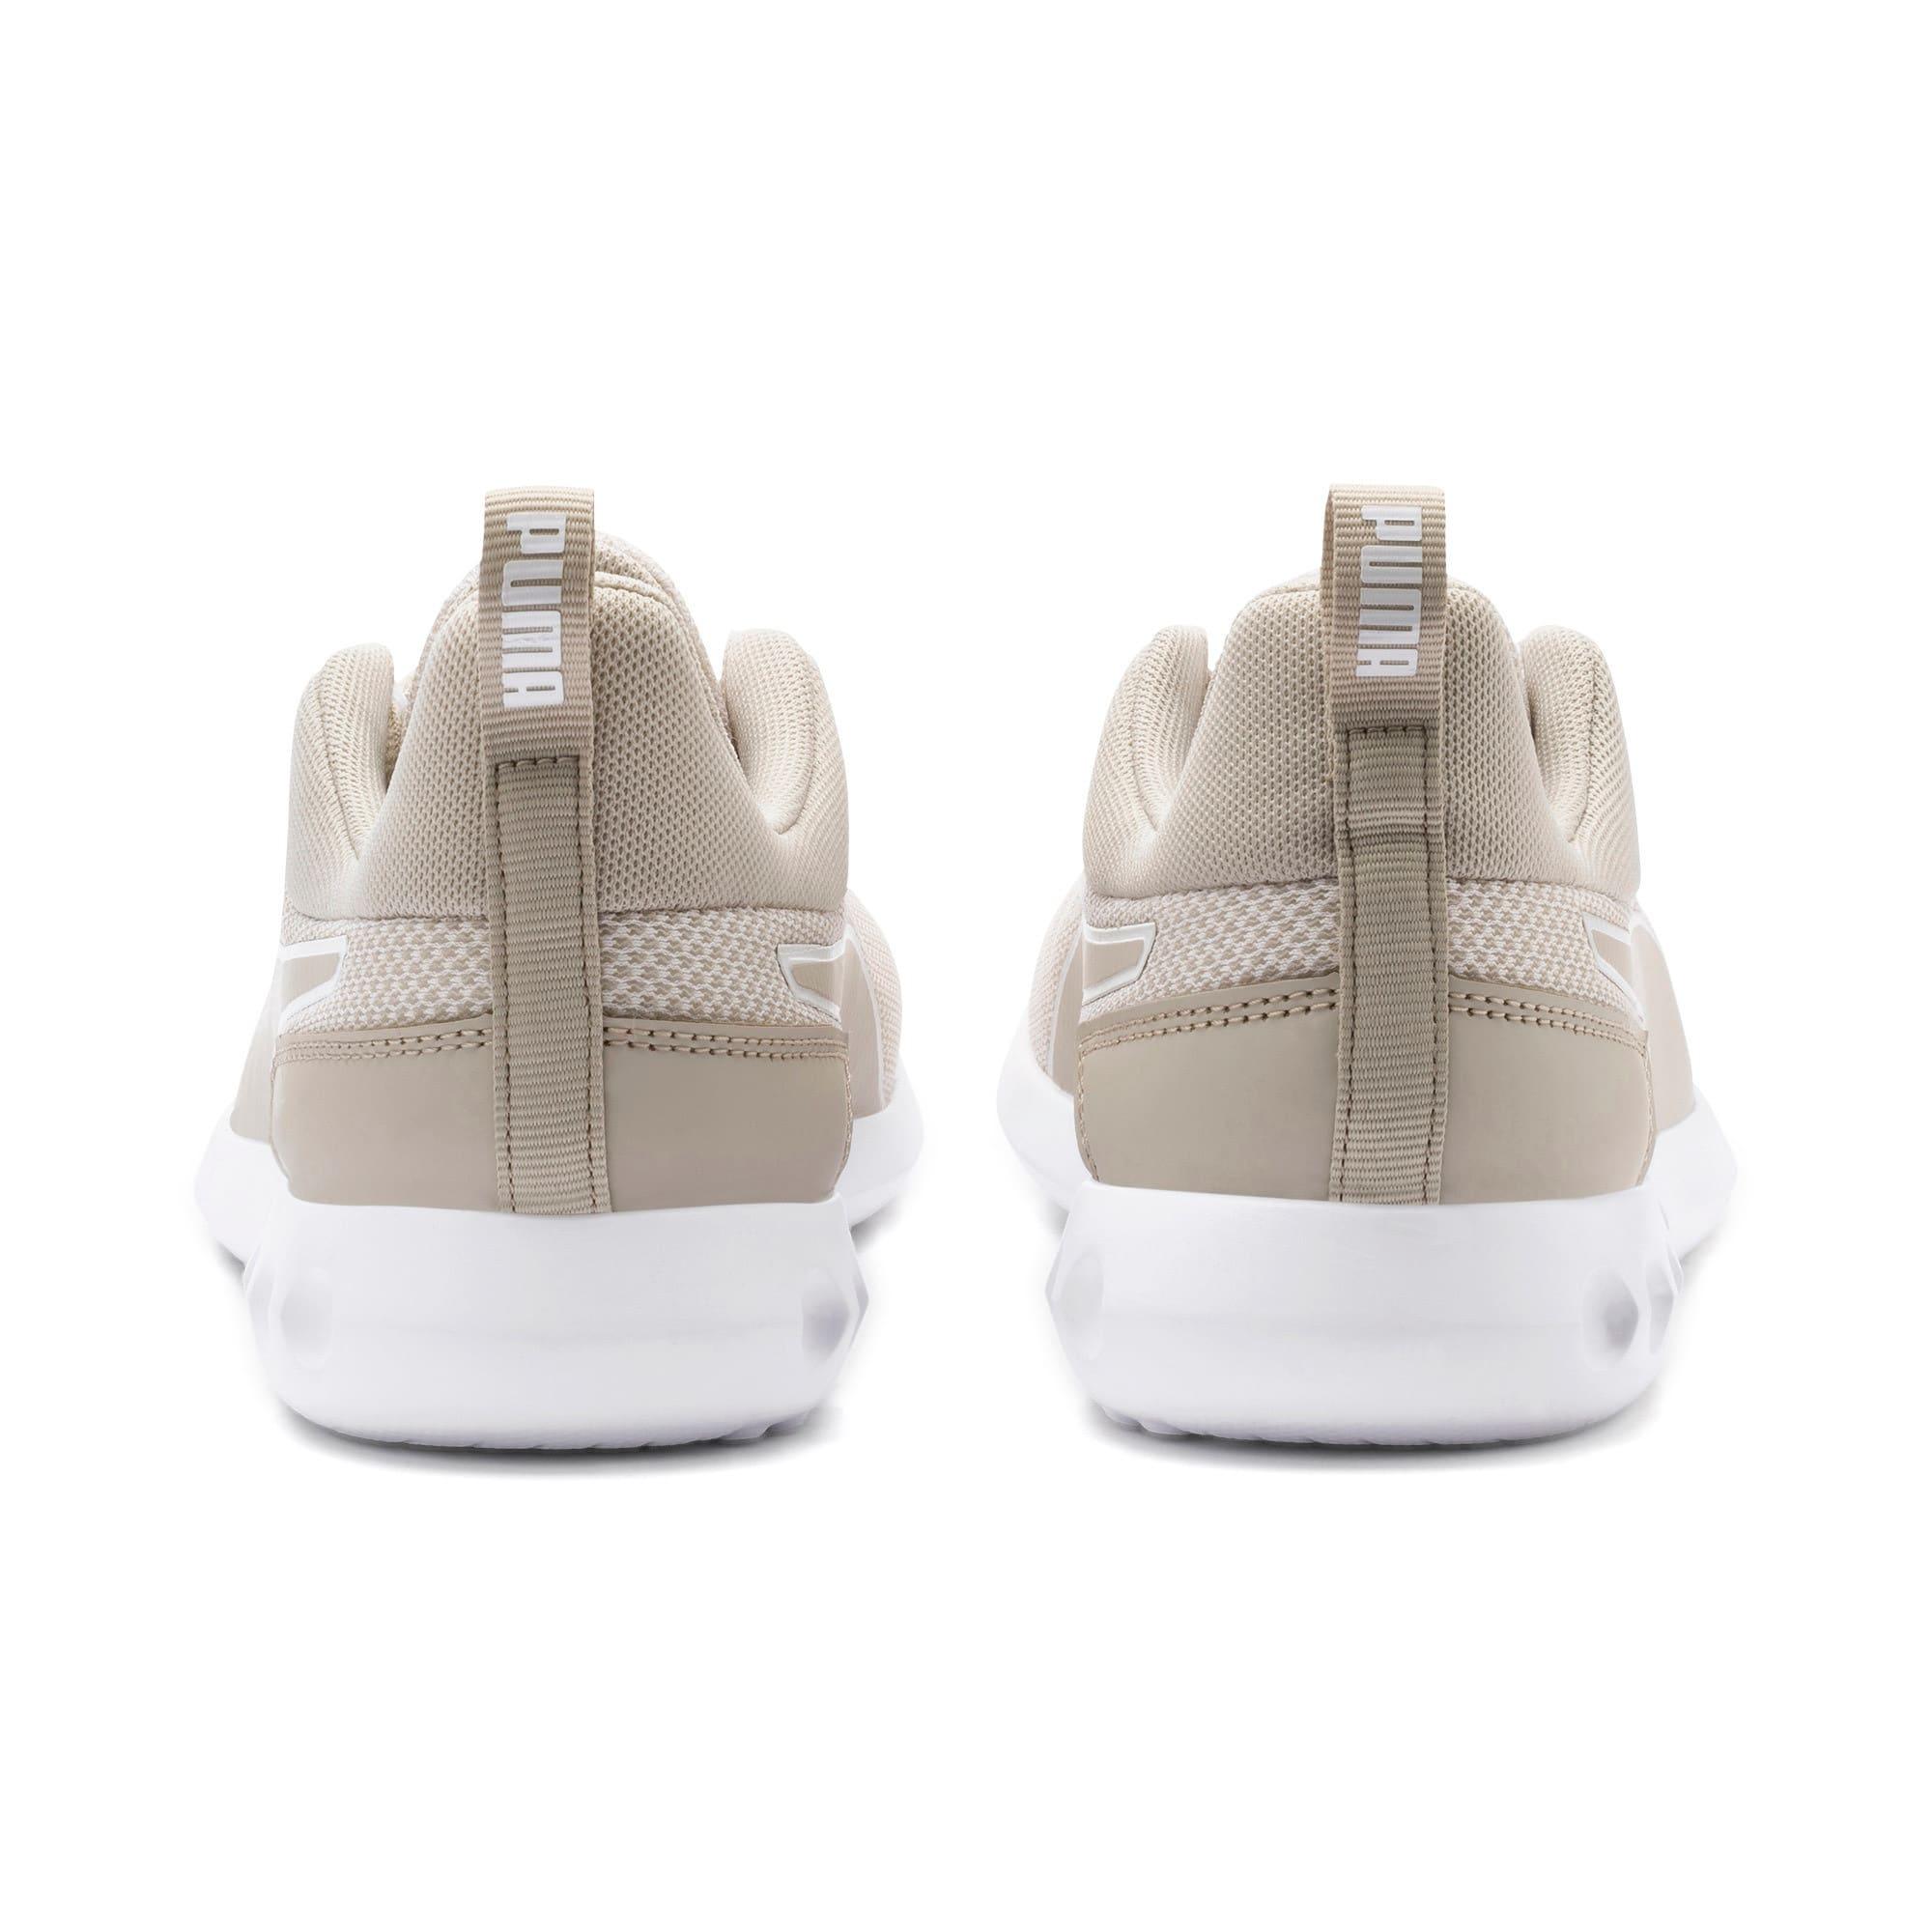 Thumbnail 3 of Carson 2 Concave Women's Training Shoes, Silver Gray-Puma White, medium